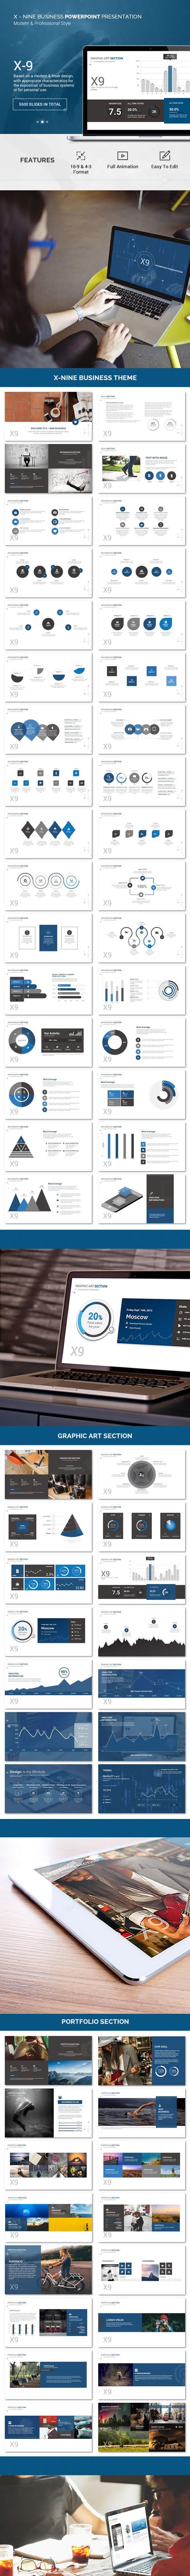 X-9 Version 3 - Premium - Business PowerPoint Templates